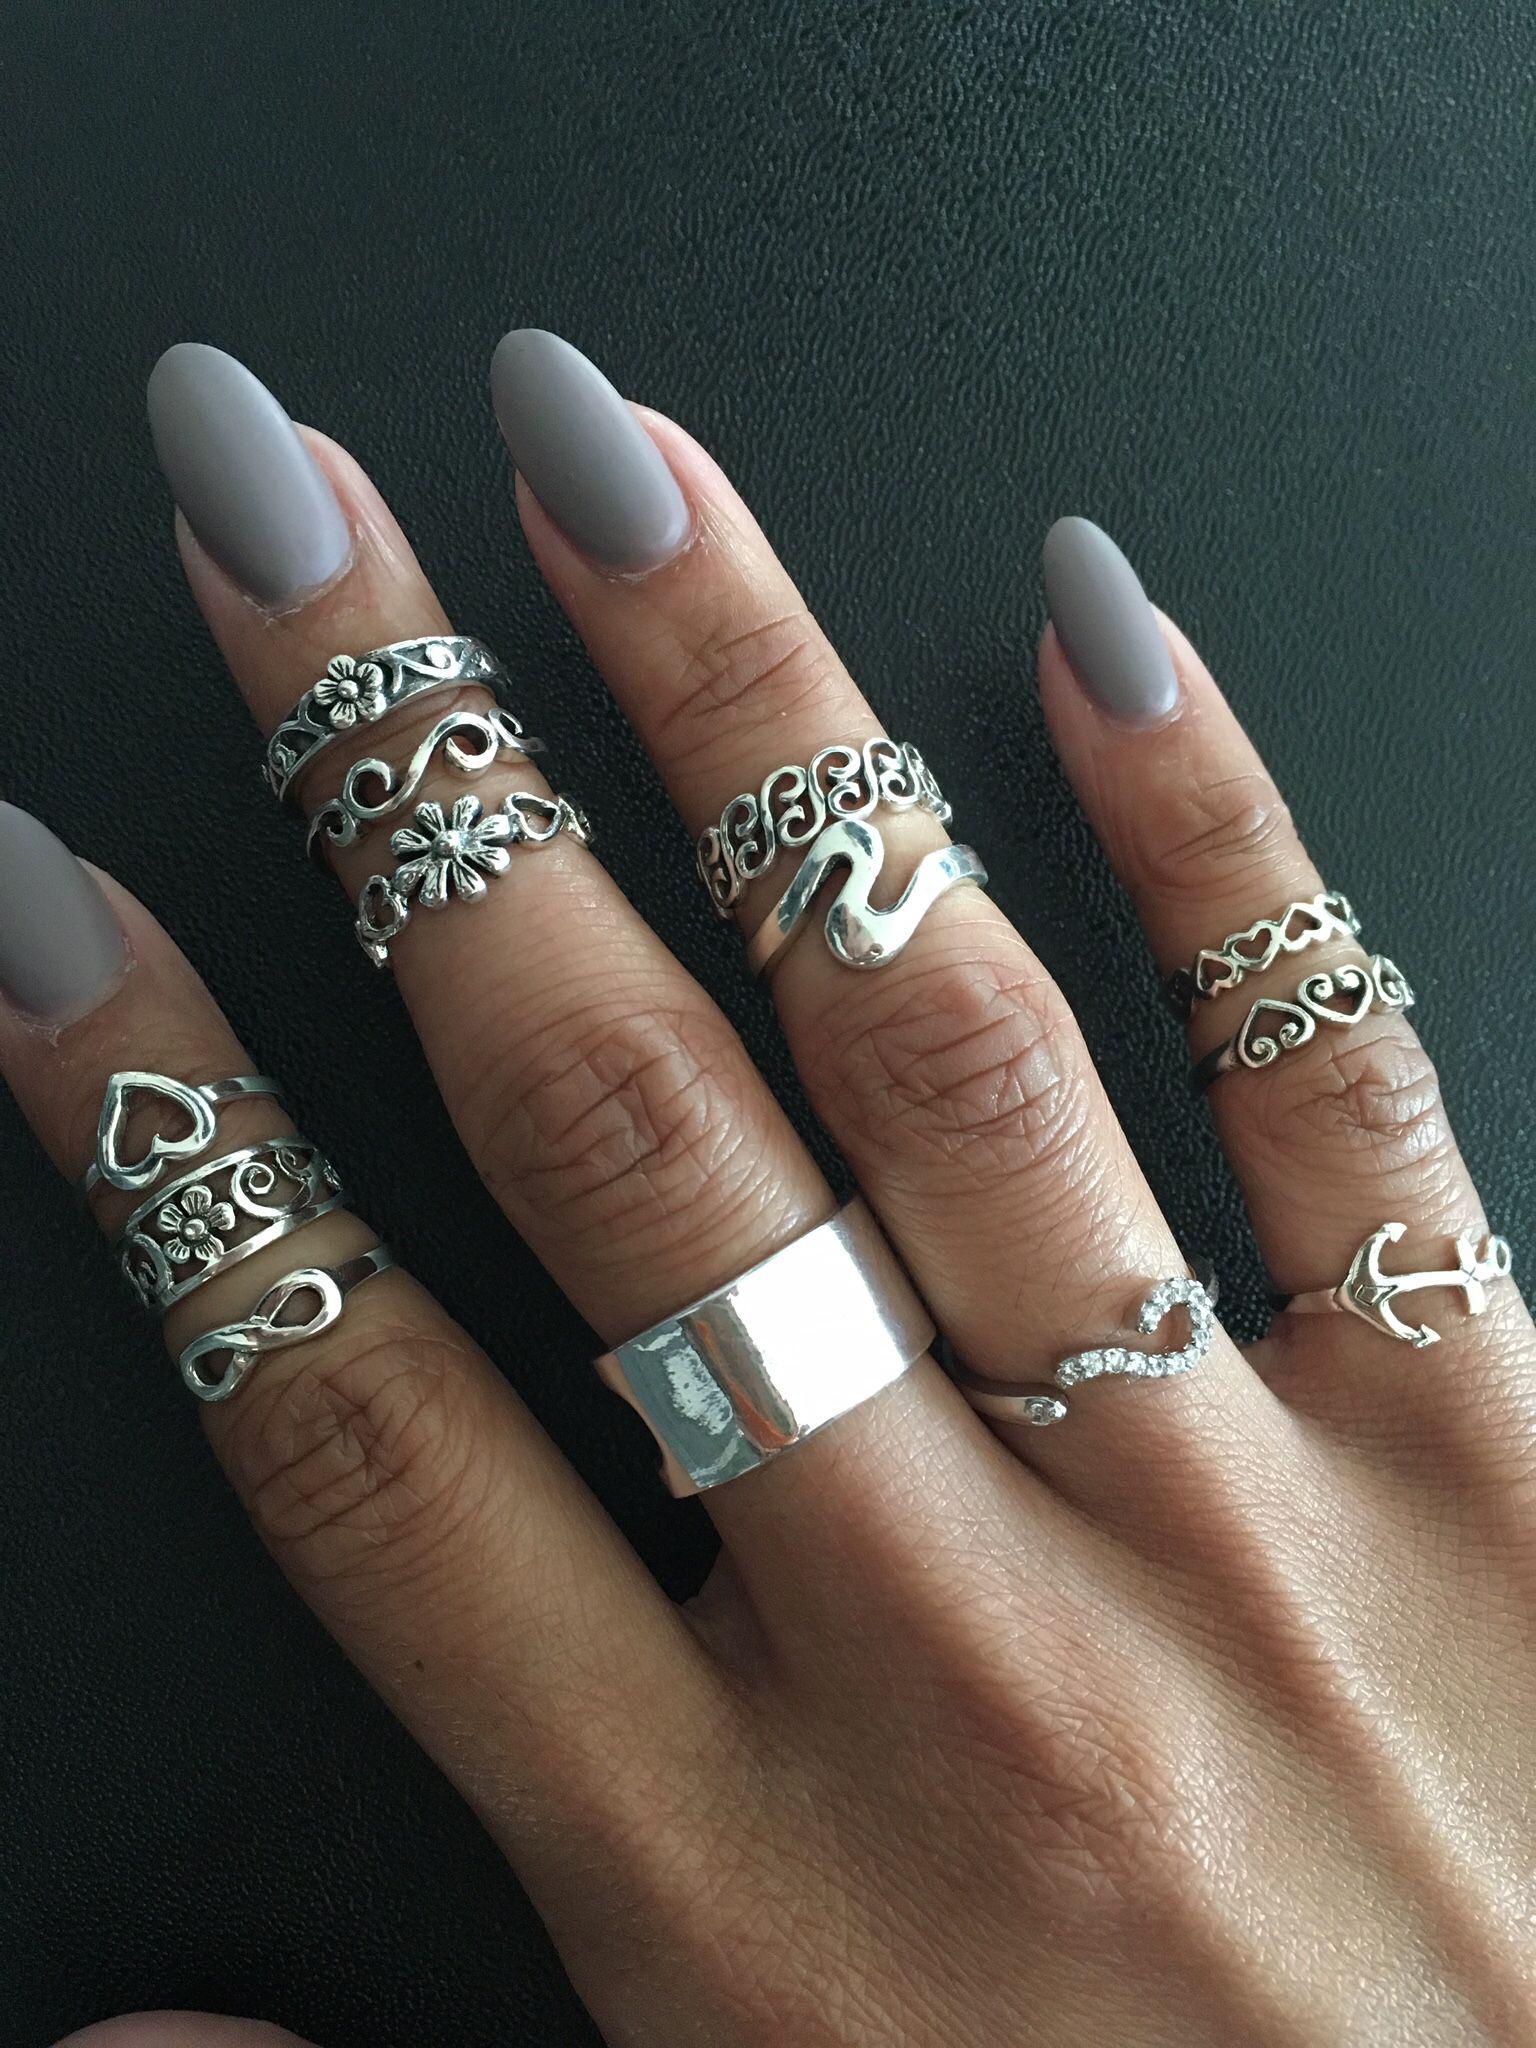 fd6b148de0b08 925 sterling silver Toe rings, Midi rings, Pinky rings, Knuckle ...